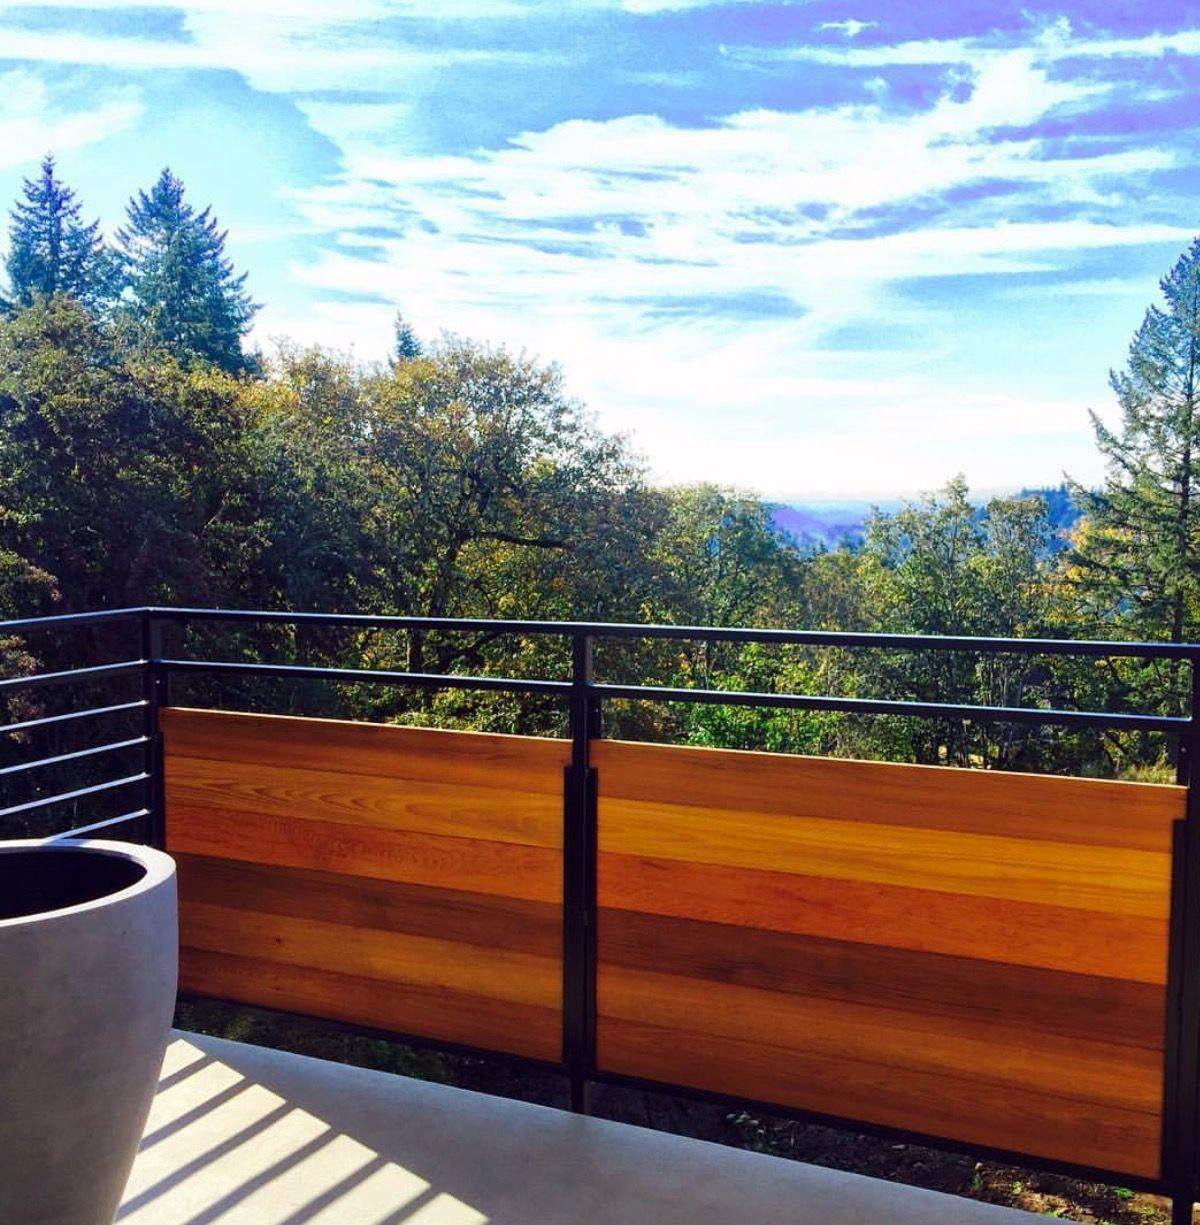 Unique Porch Hand Railing For Your Cozy Home